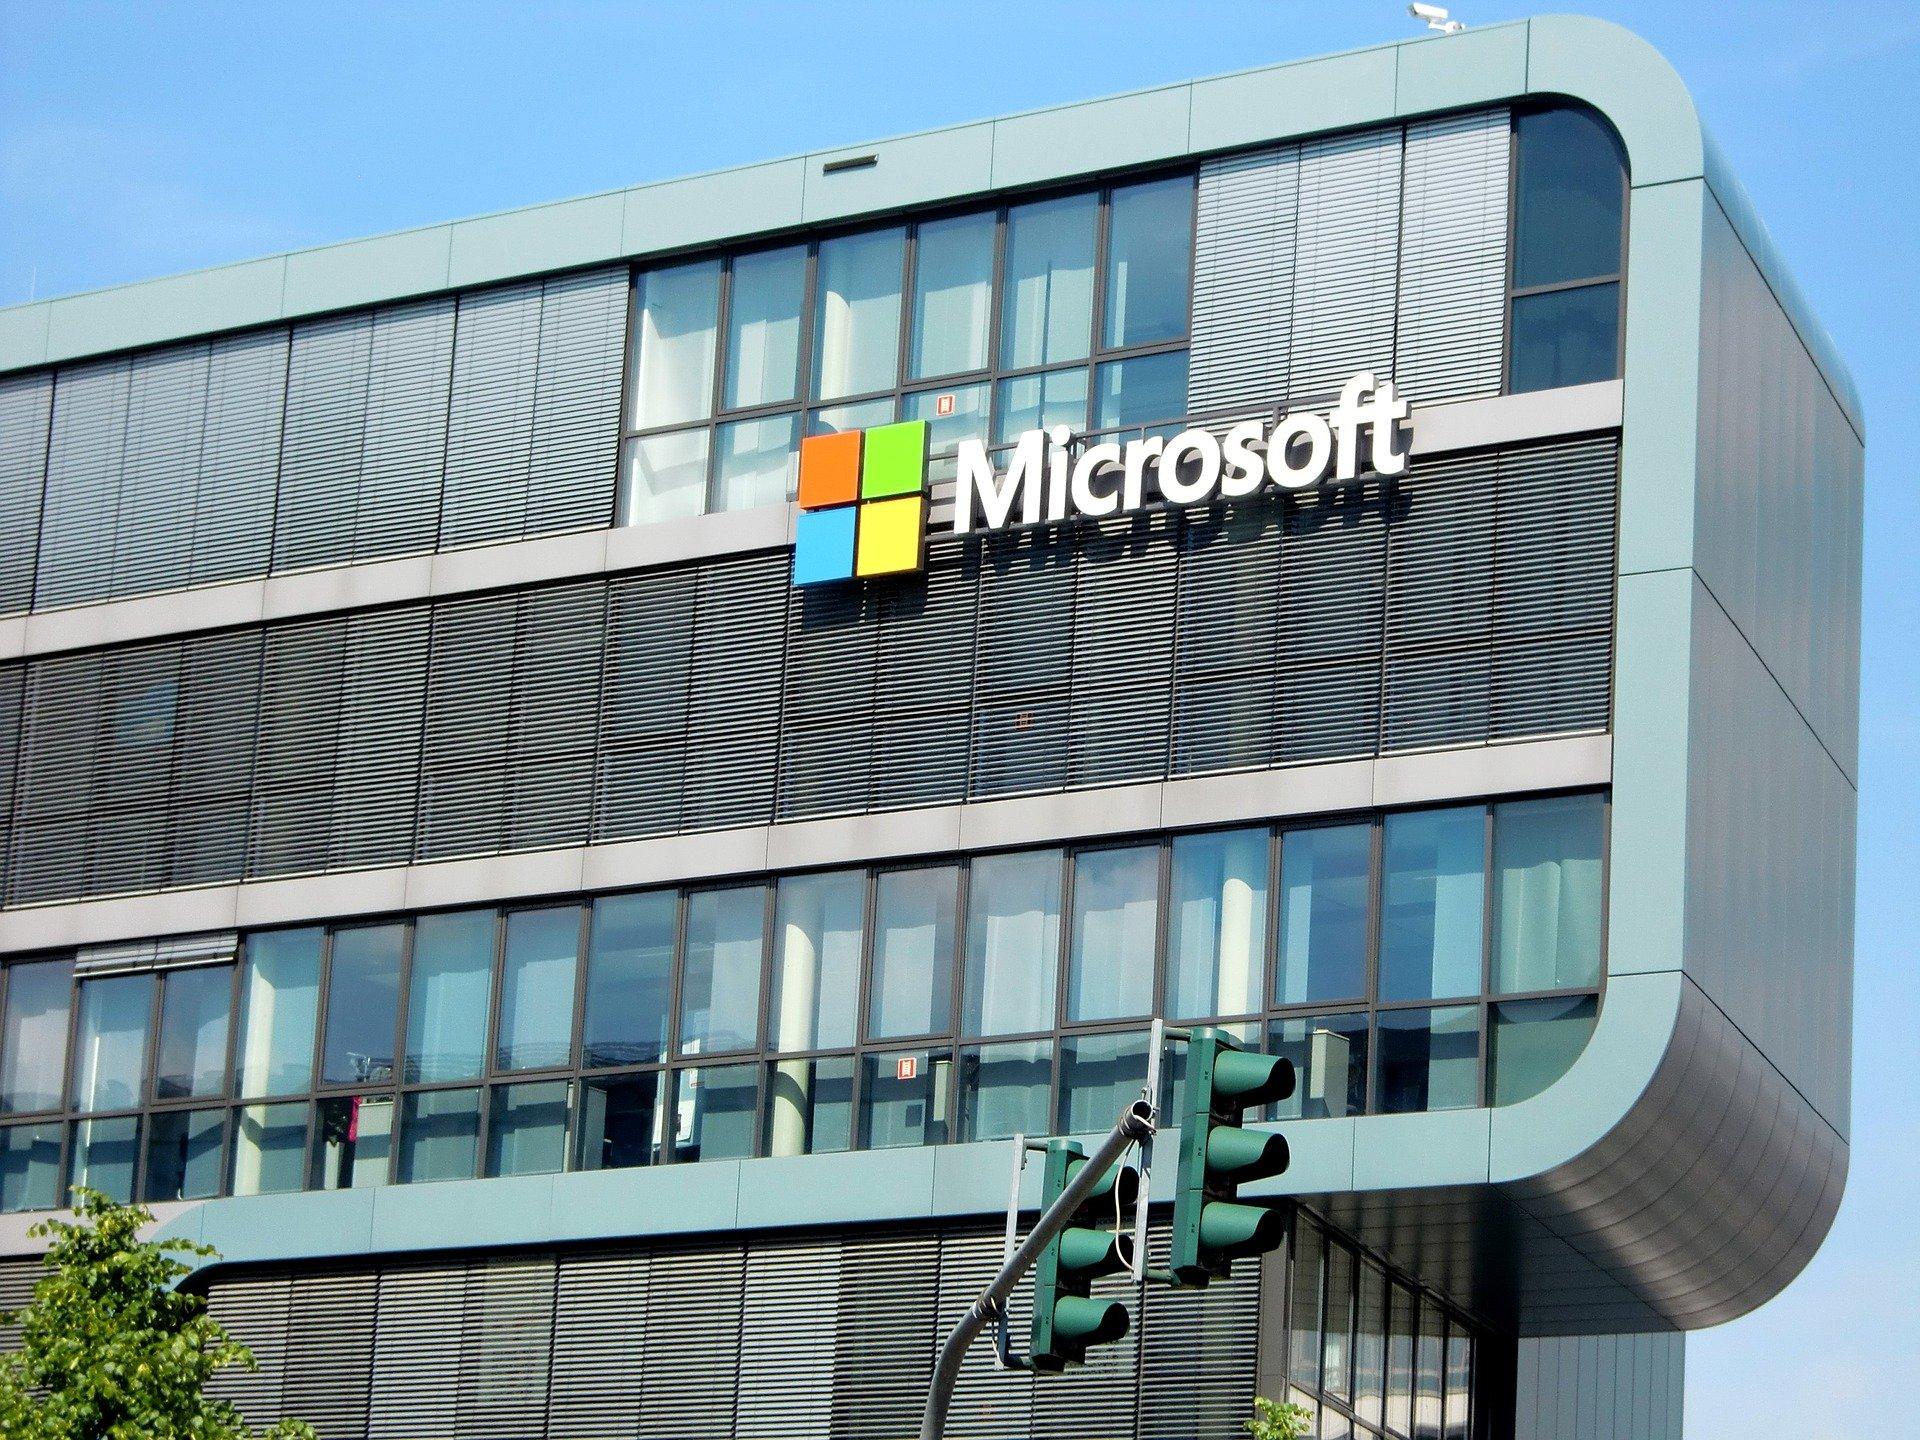 image of Microsoft building across a blue sky